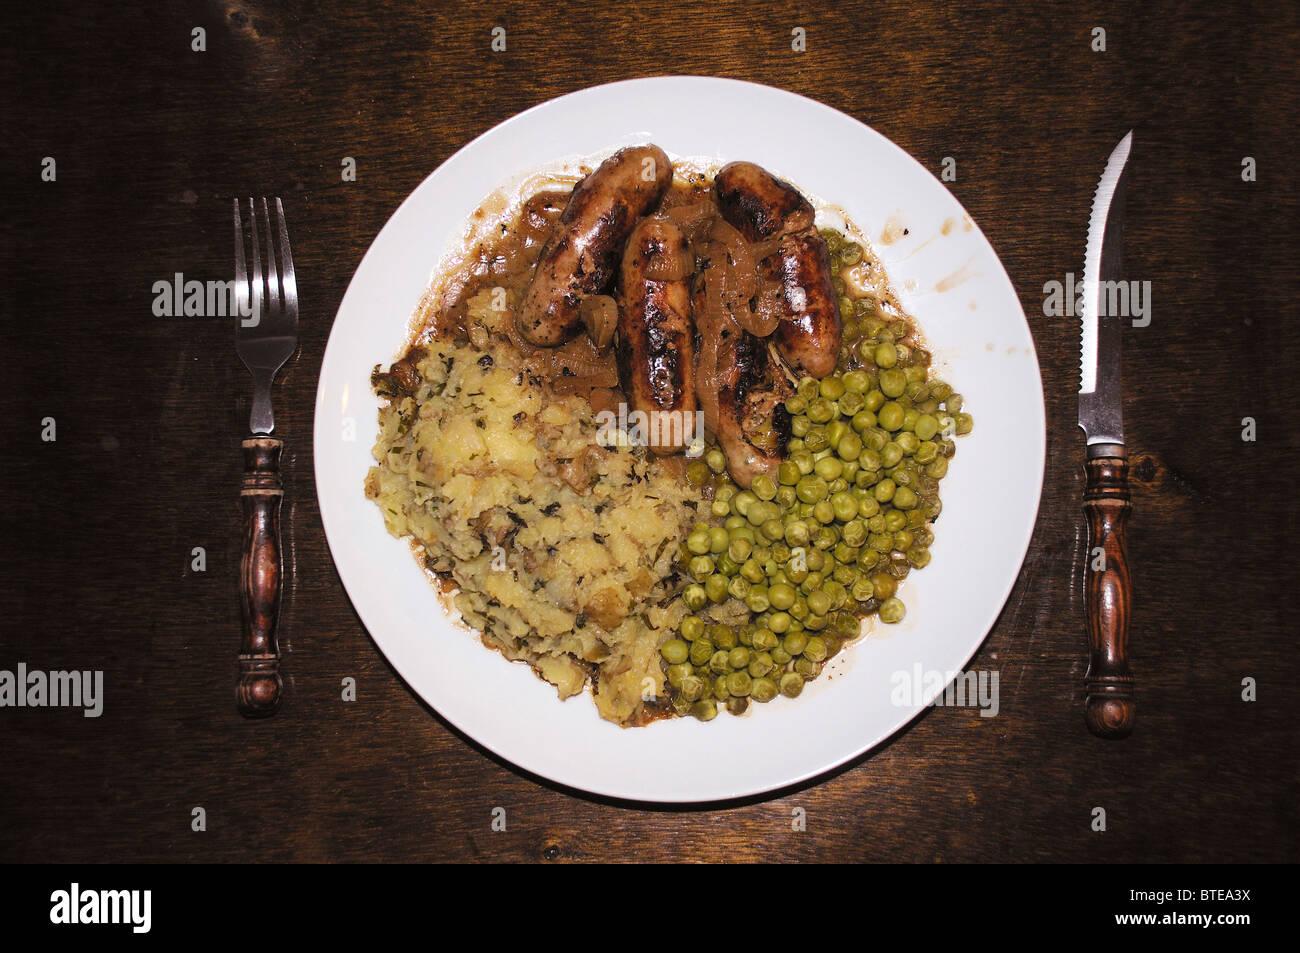 Bangers and mash, a dish consisting of sausage, mashed potatoes and peas Stock Photo